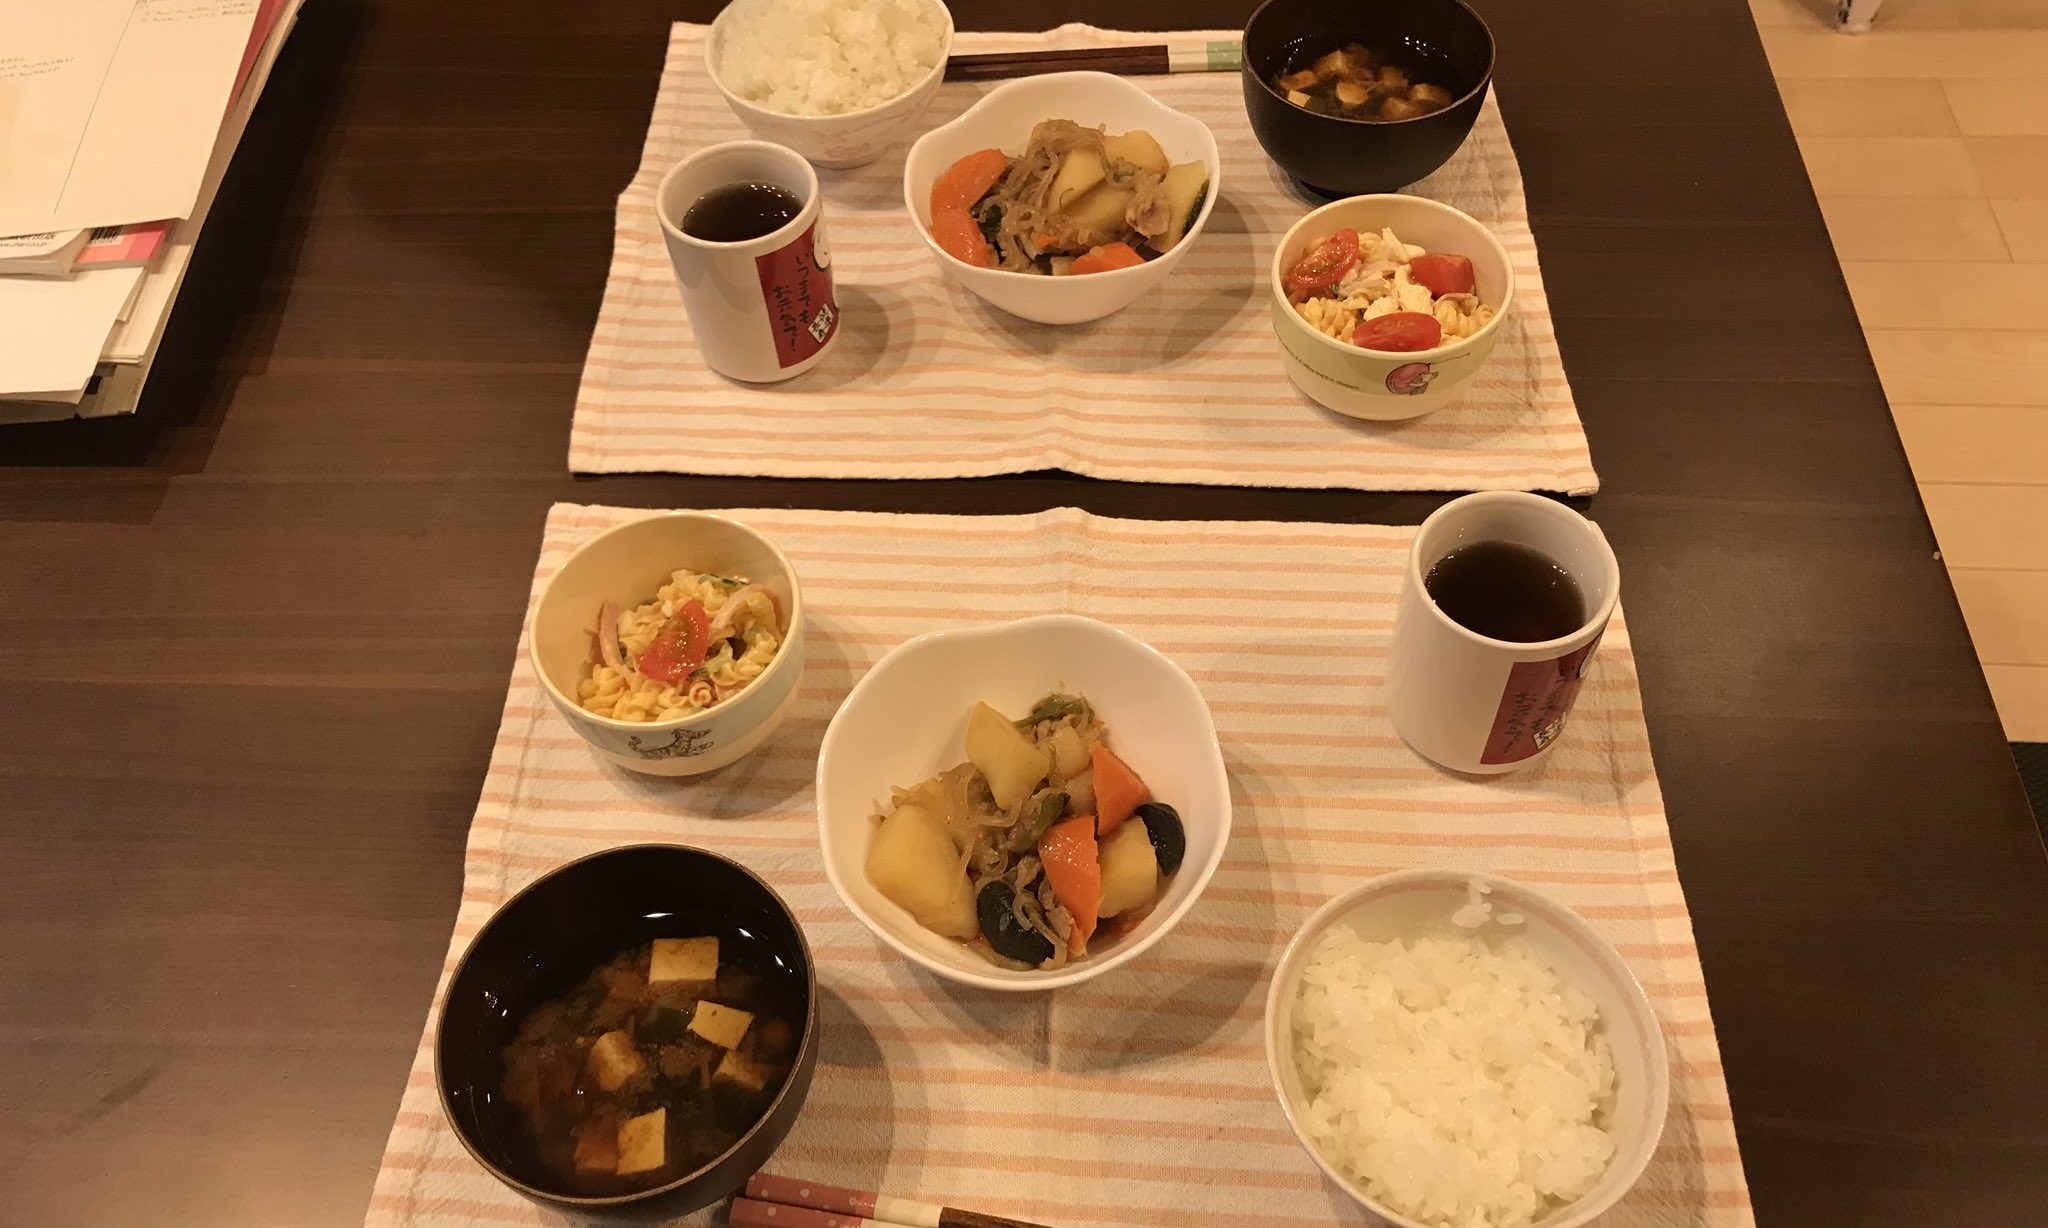 嫁34歳が作った料理wwwwwwwwwwww